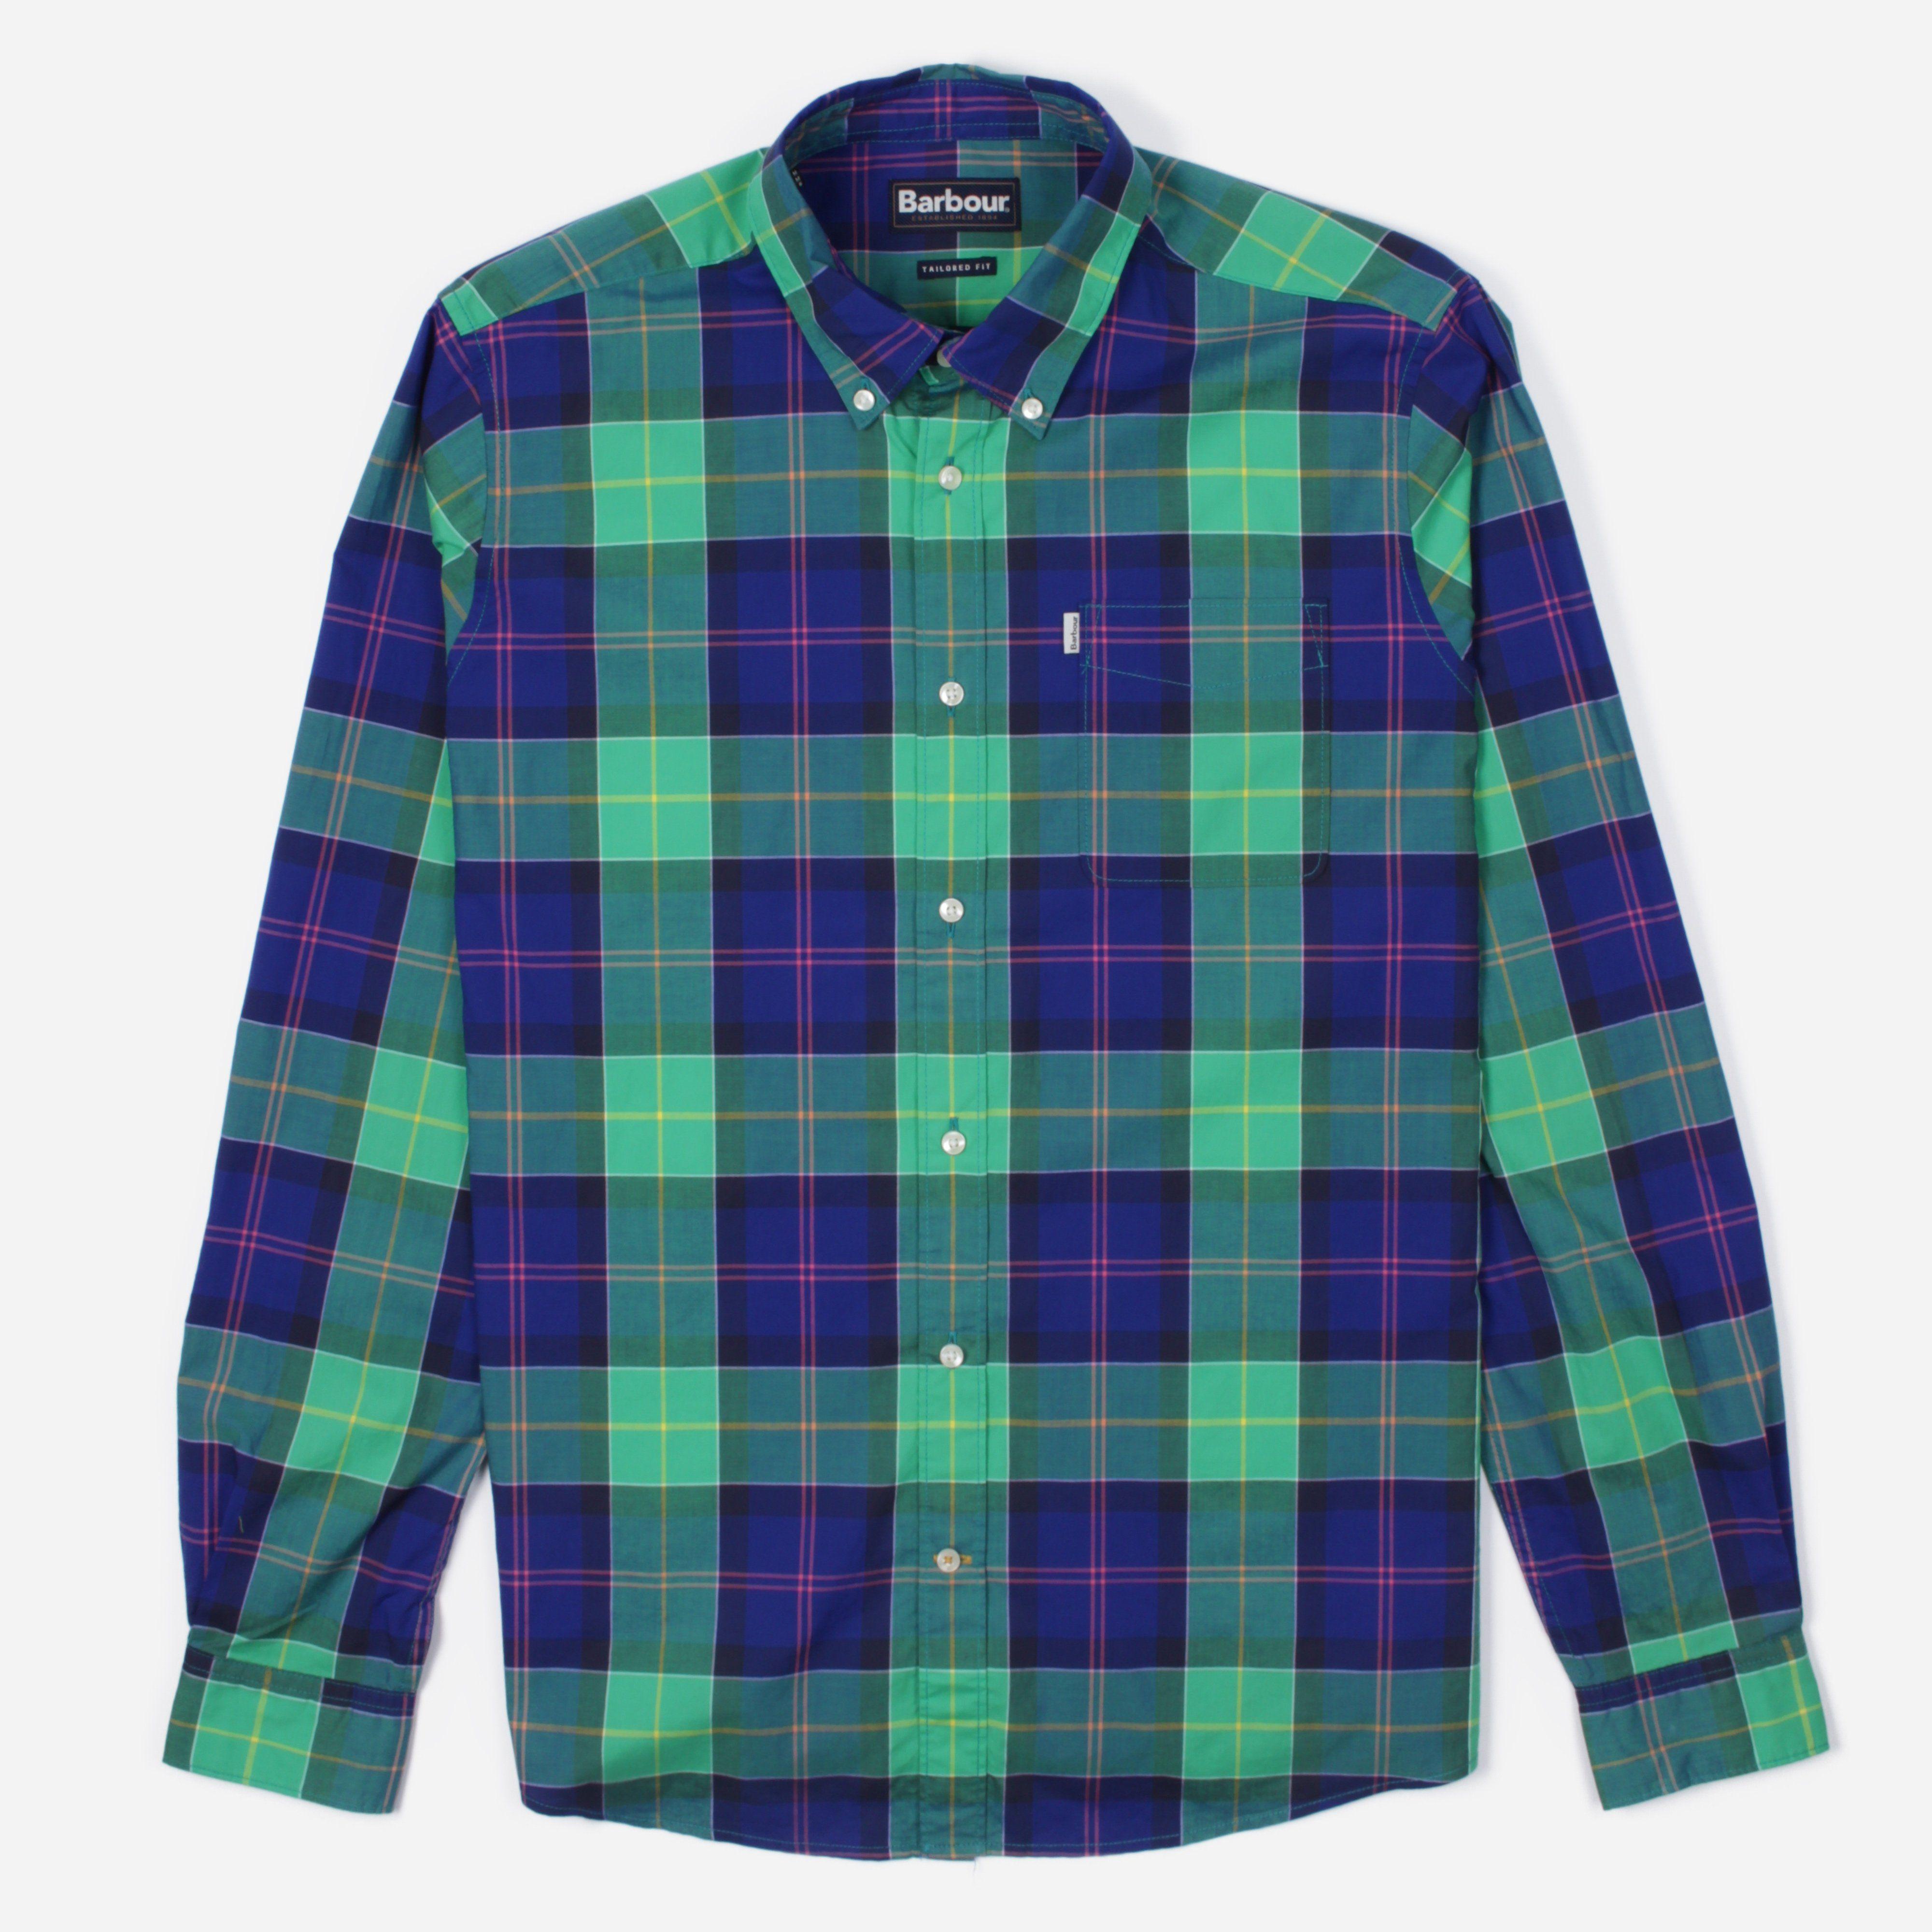 Barbour Toward LS Check Shirt